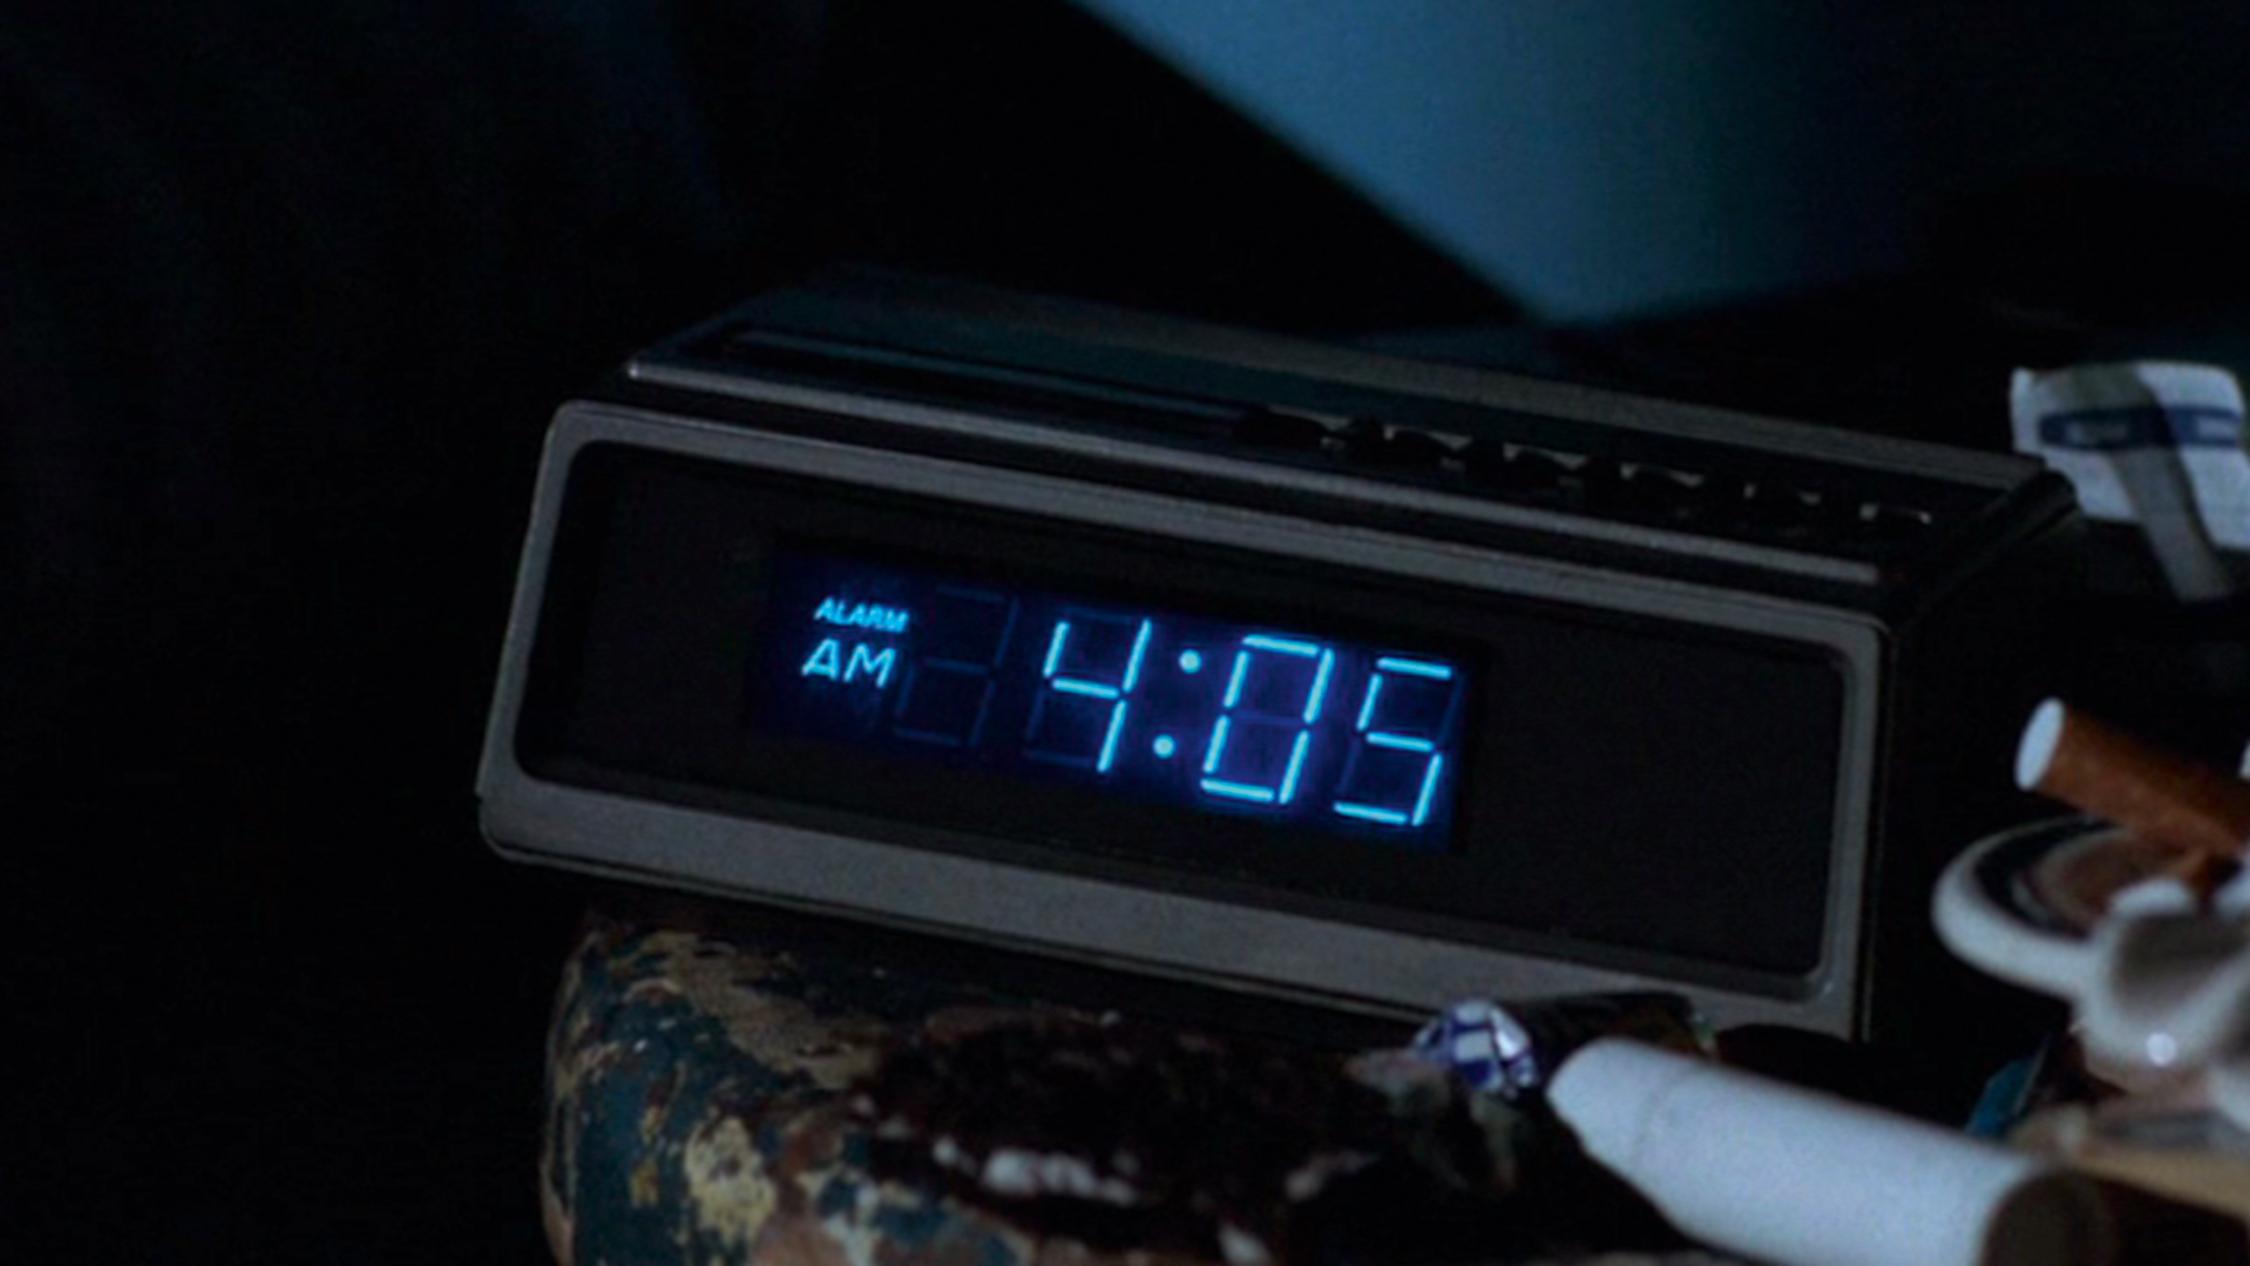 Christian Marclay, 'The Clock' 2010